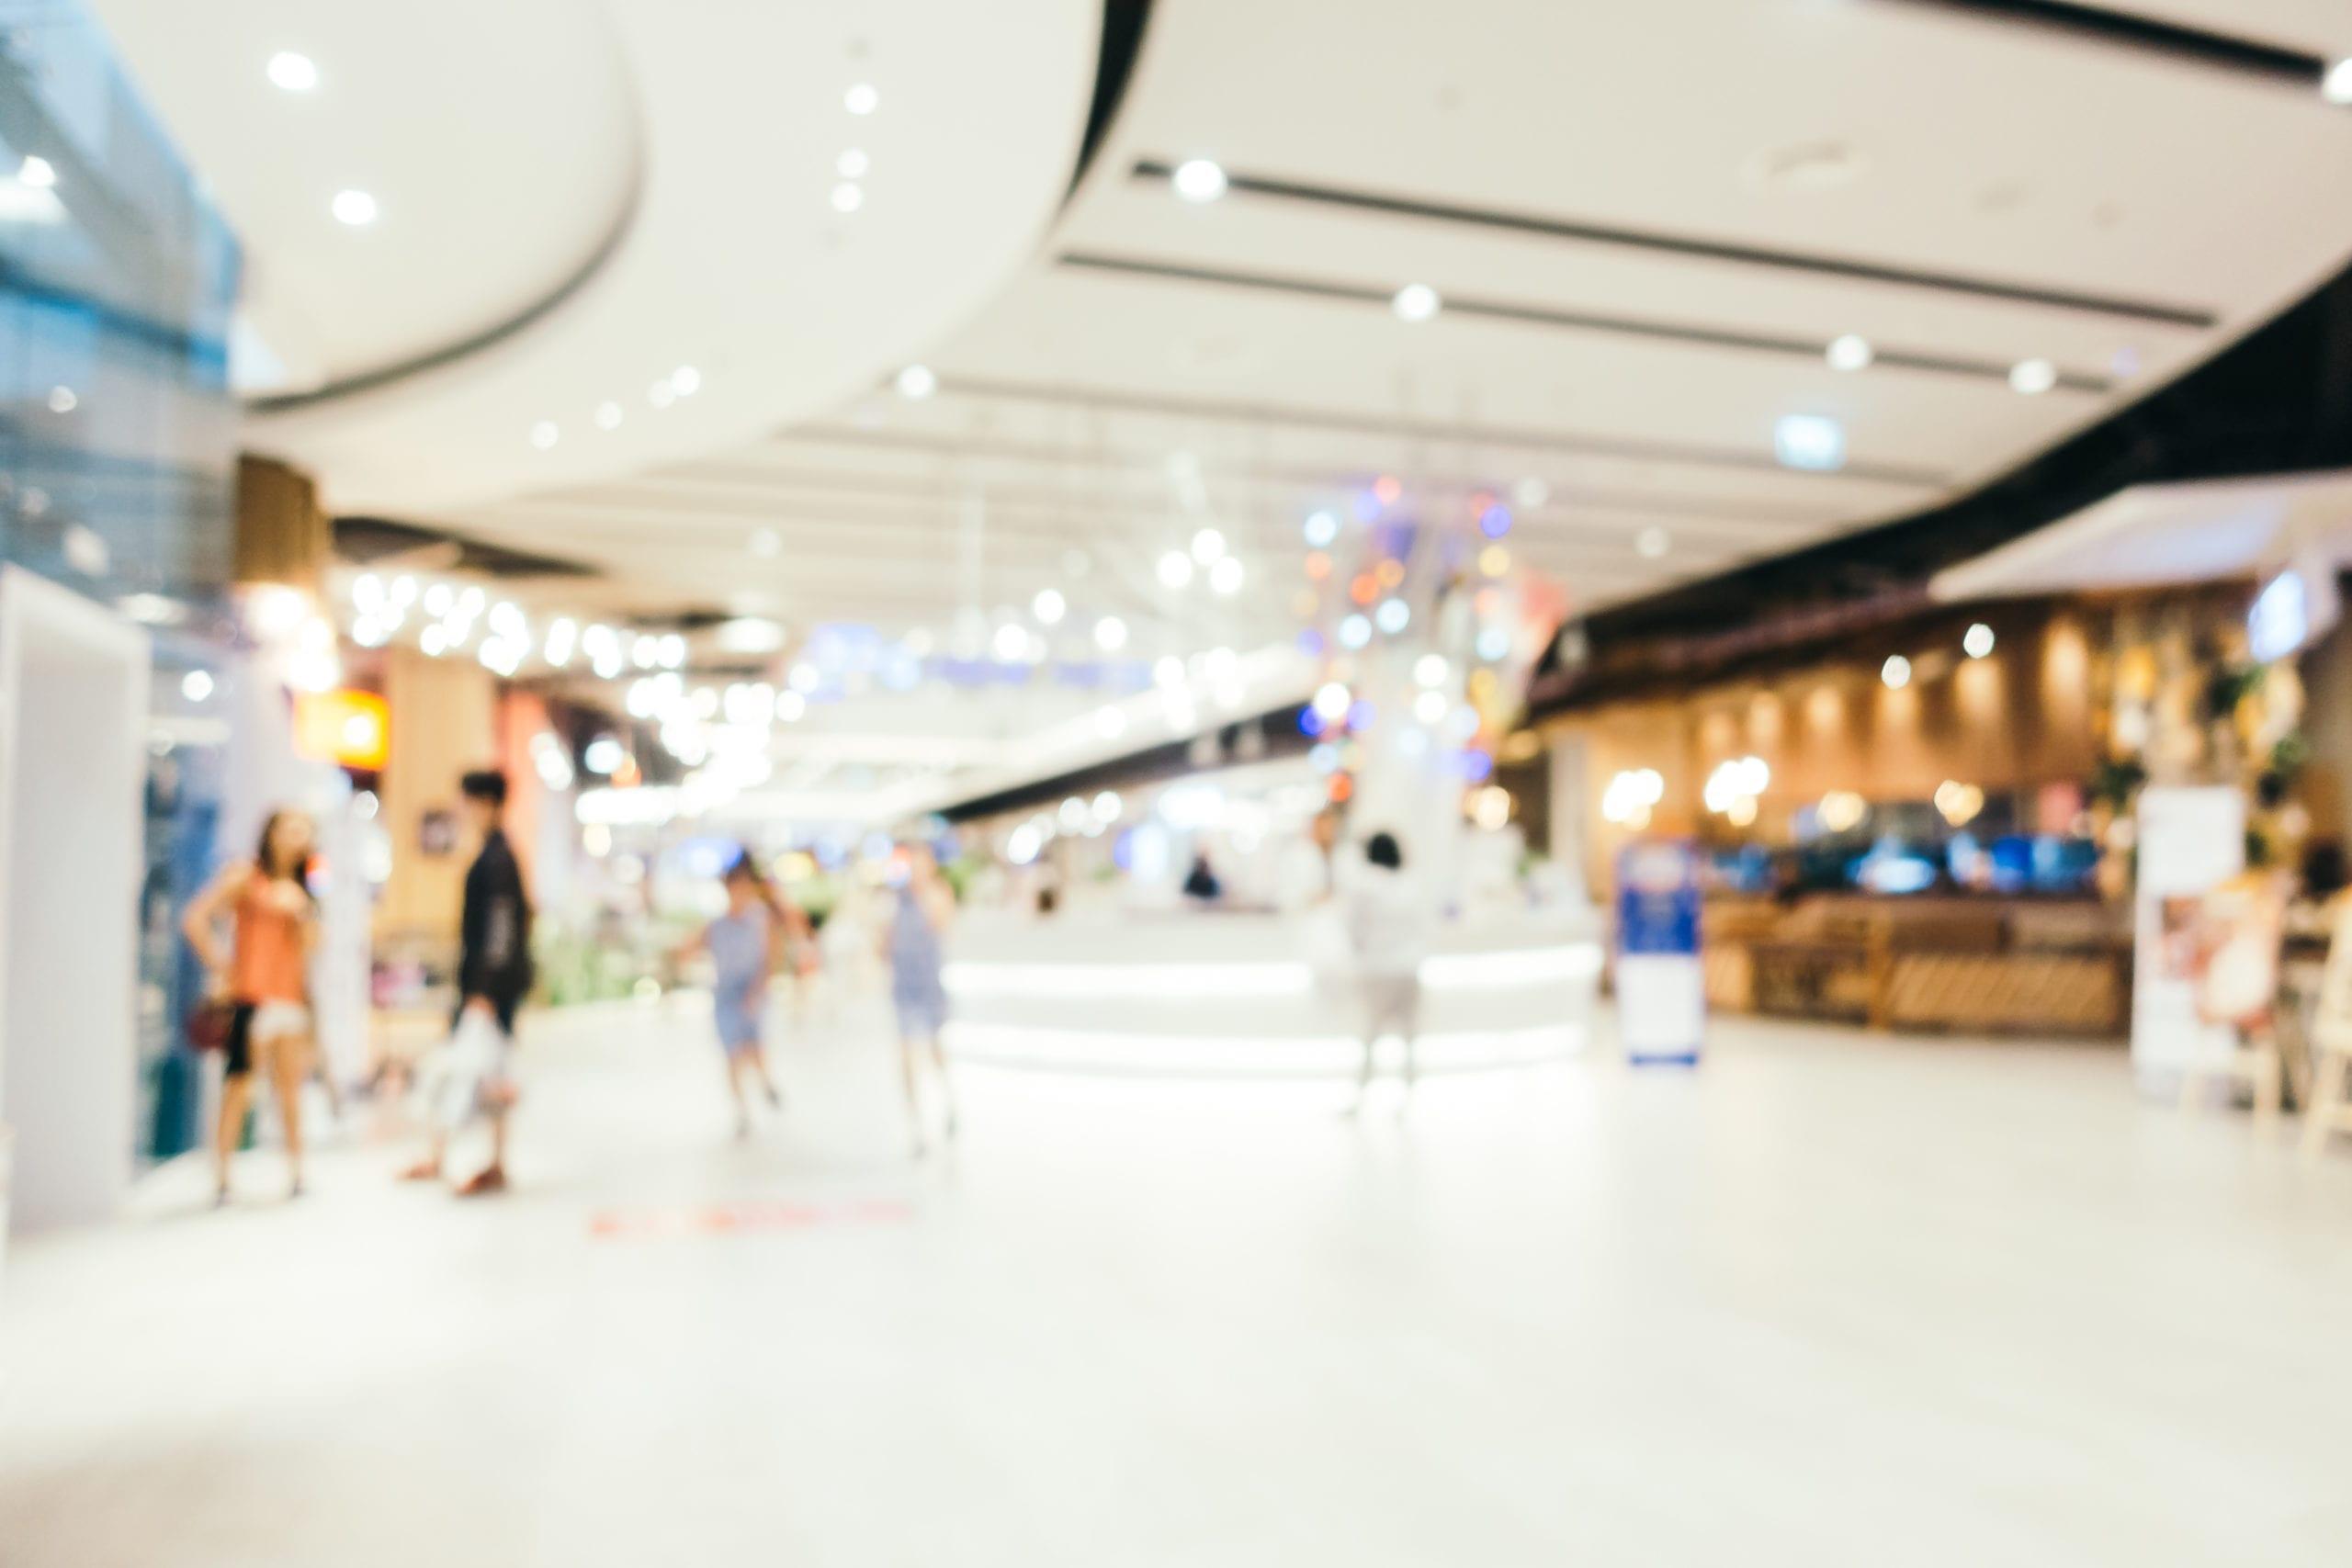 blurred shopping mall